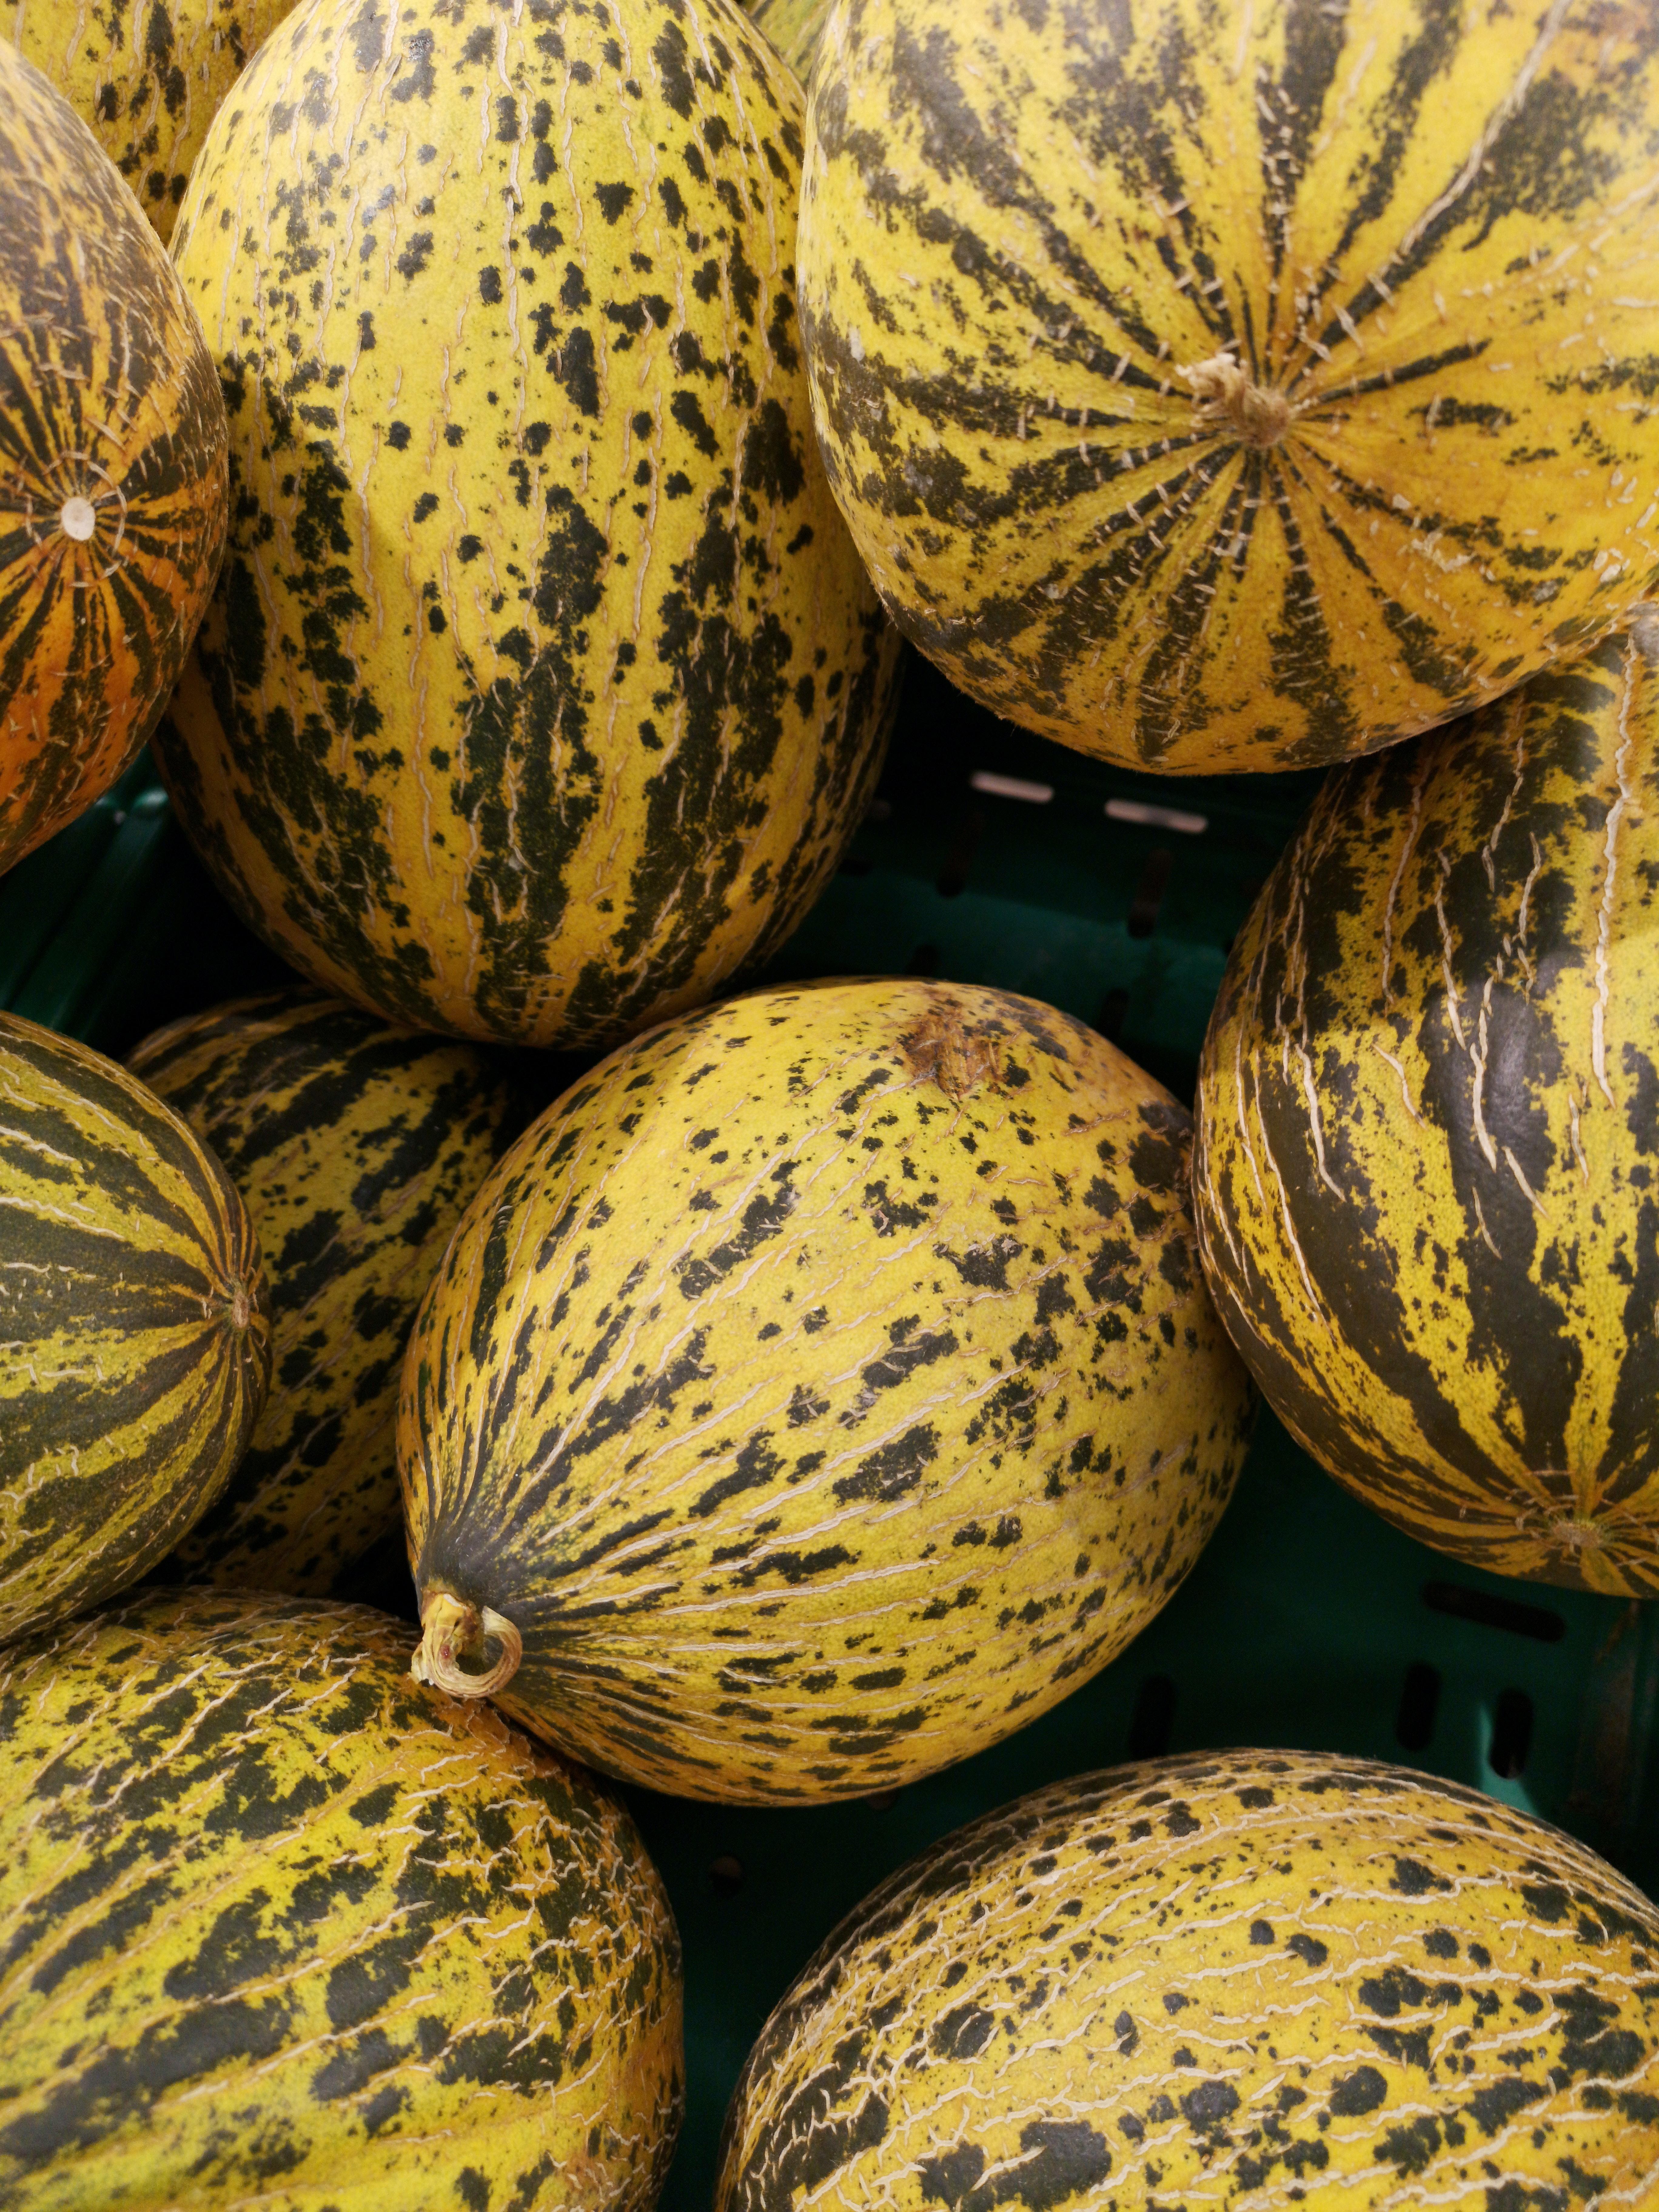 Round Yellow Fruits · Free Stock Photo